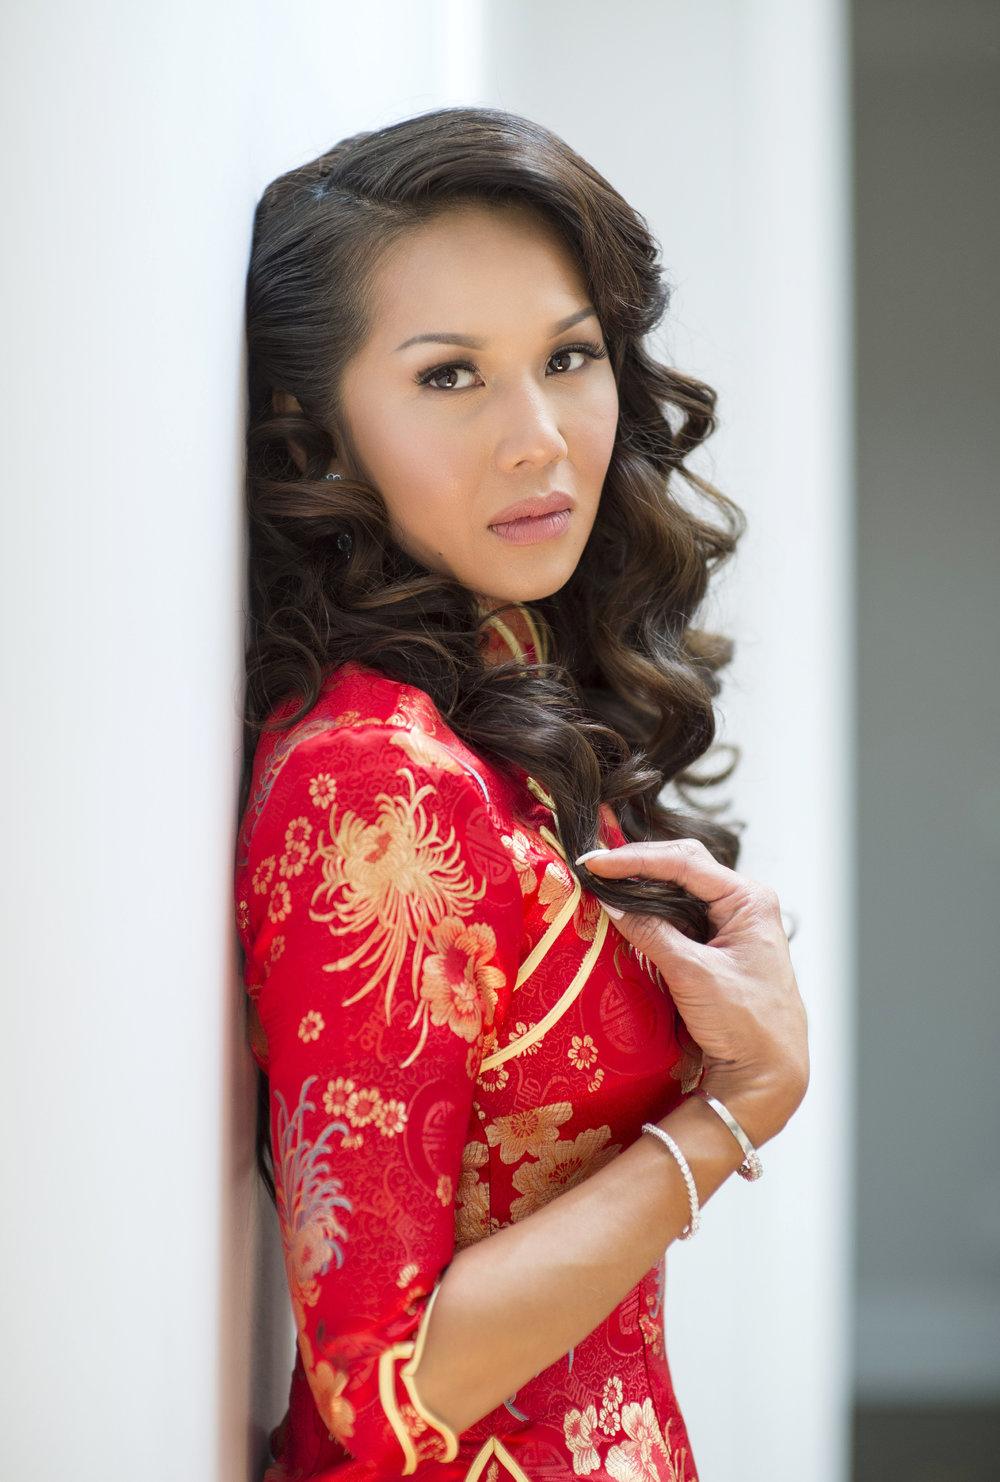 Tianna-Tran-Vancouver-Wedding-Makeup-Artist-Bridal-009.JPG